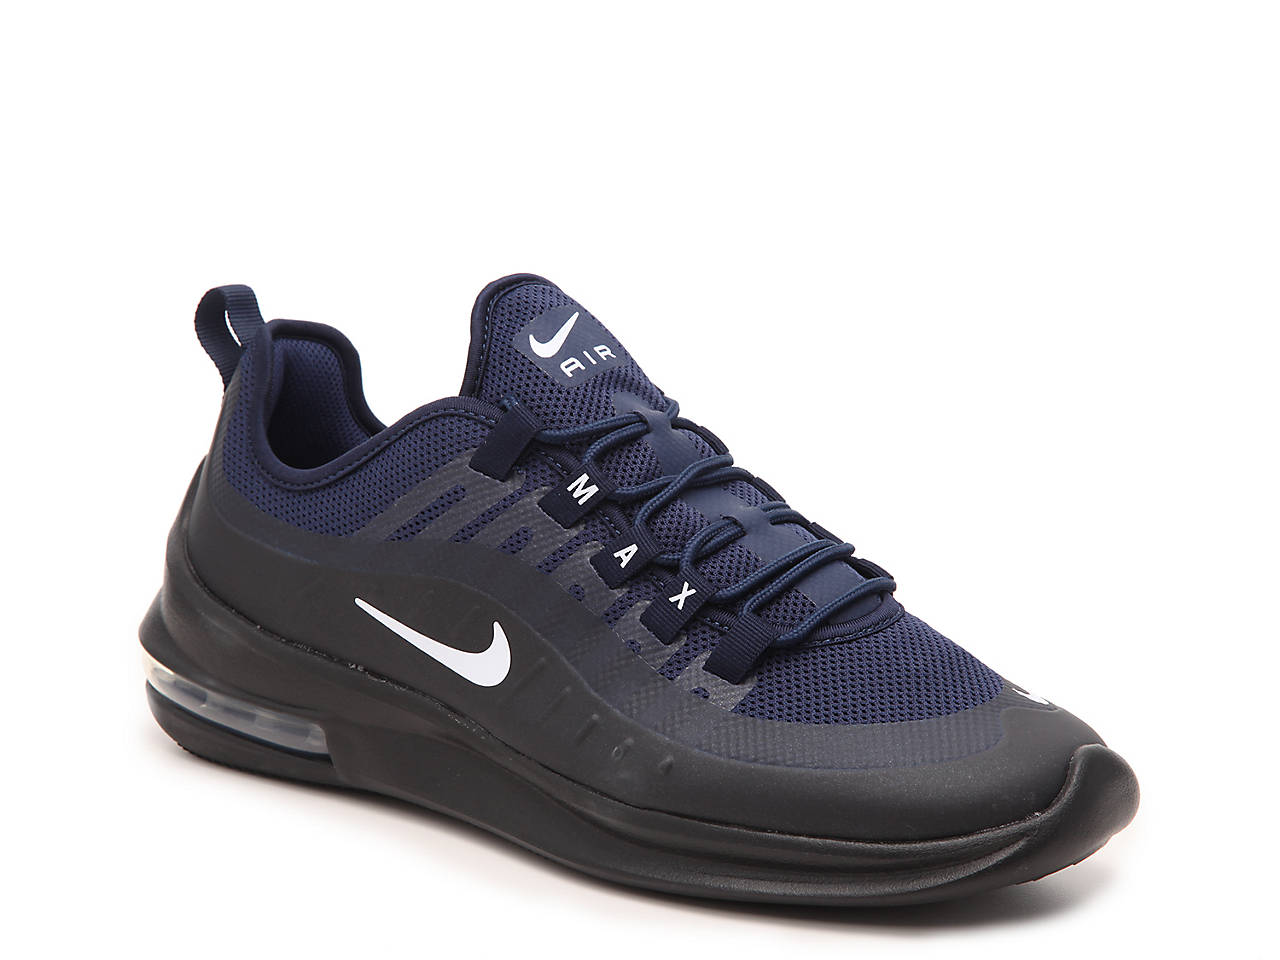 timeless design 9416c fd458 Nike. Air Max Axis Sneaker - Men s